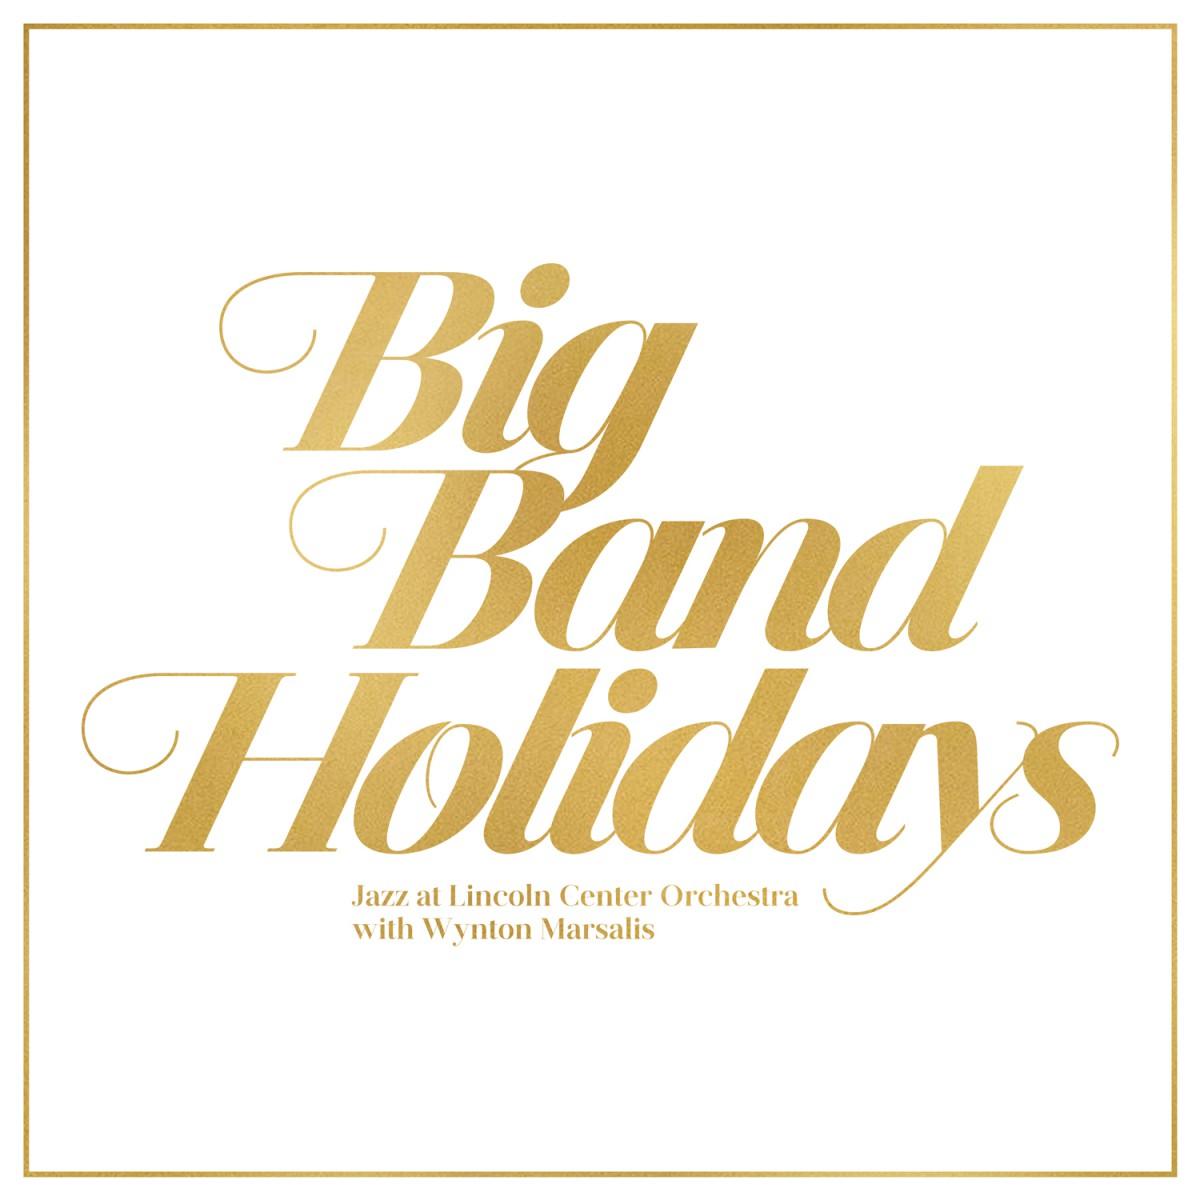 Big Band Holidays – Wynton Marsalis Official Website